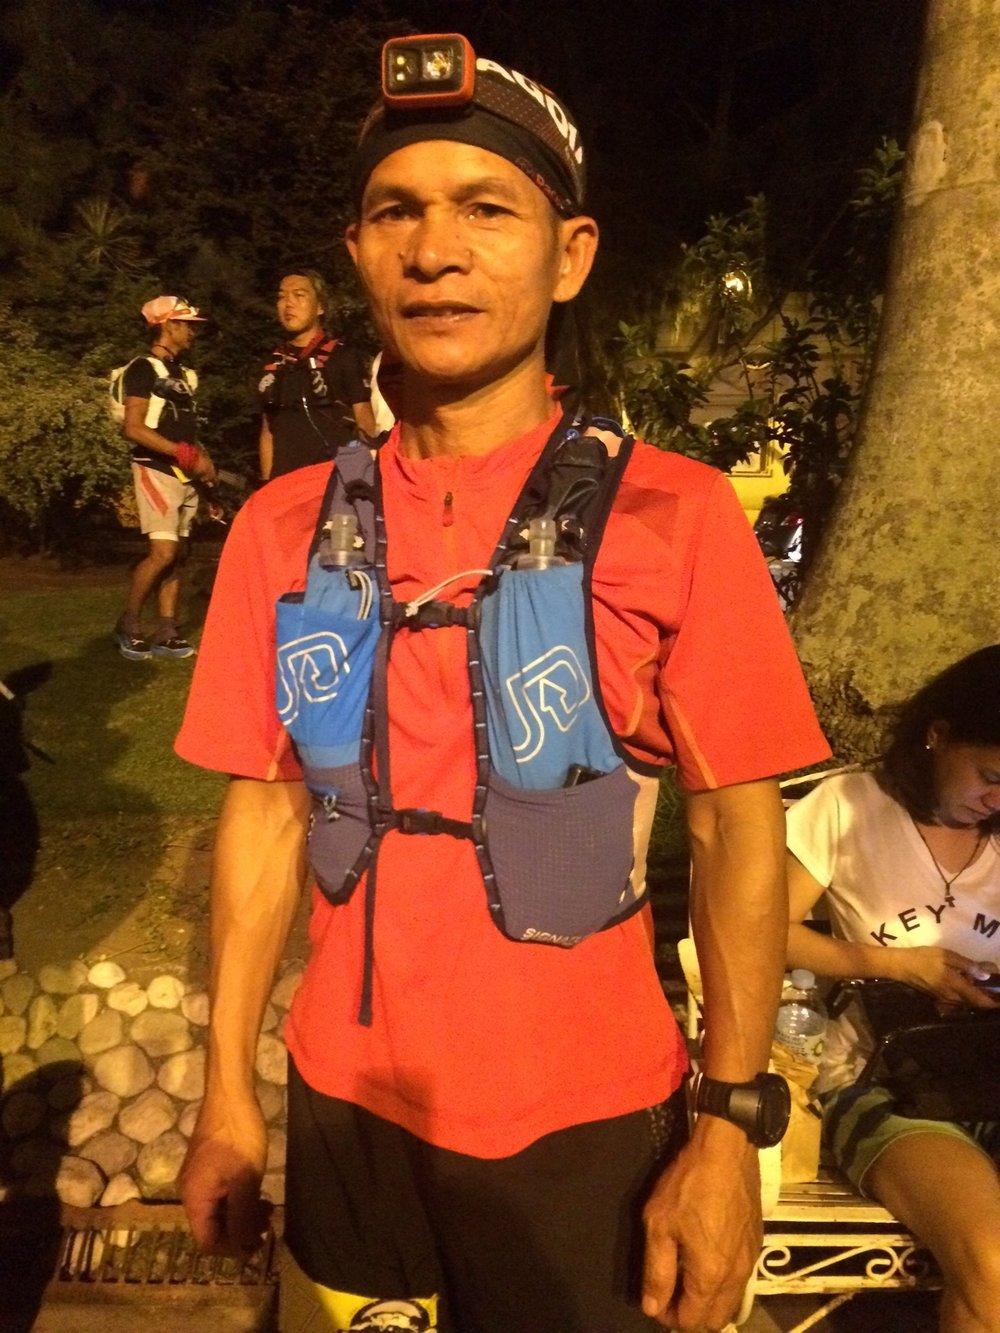 Rene Amigleo is a new Asia Trail Grandmaster